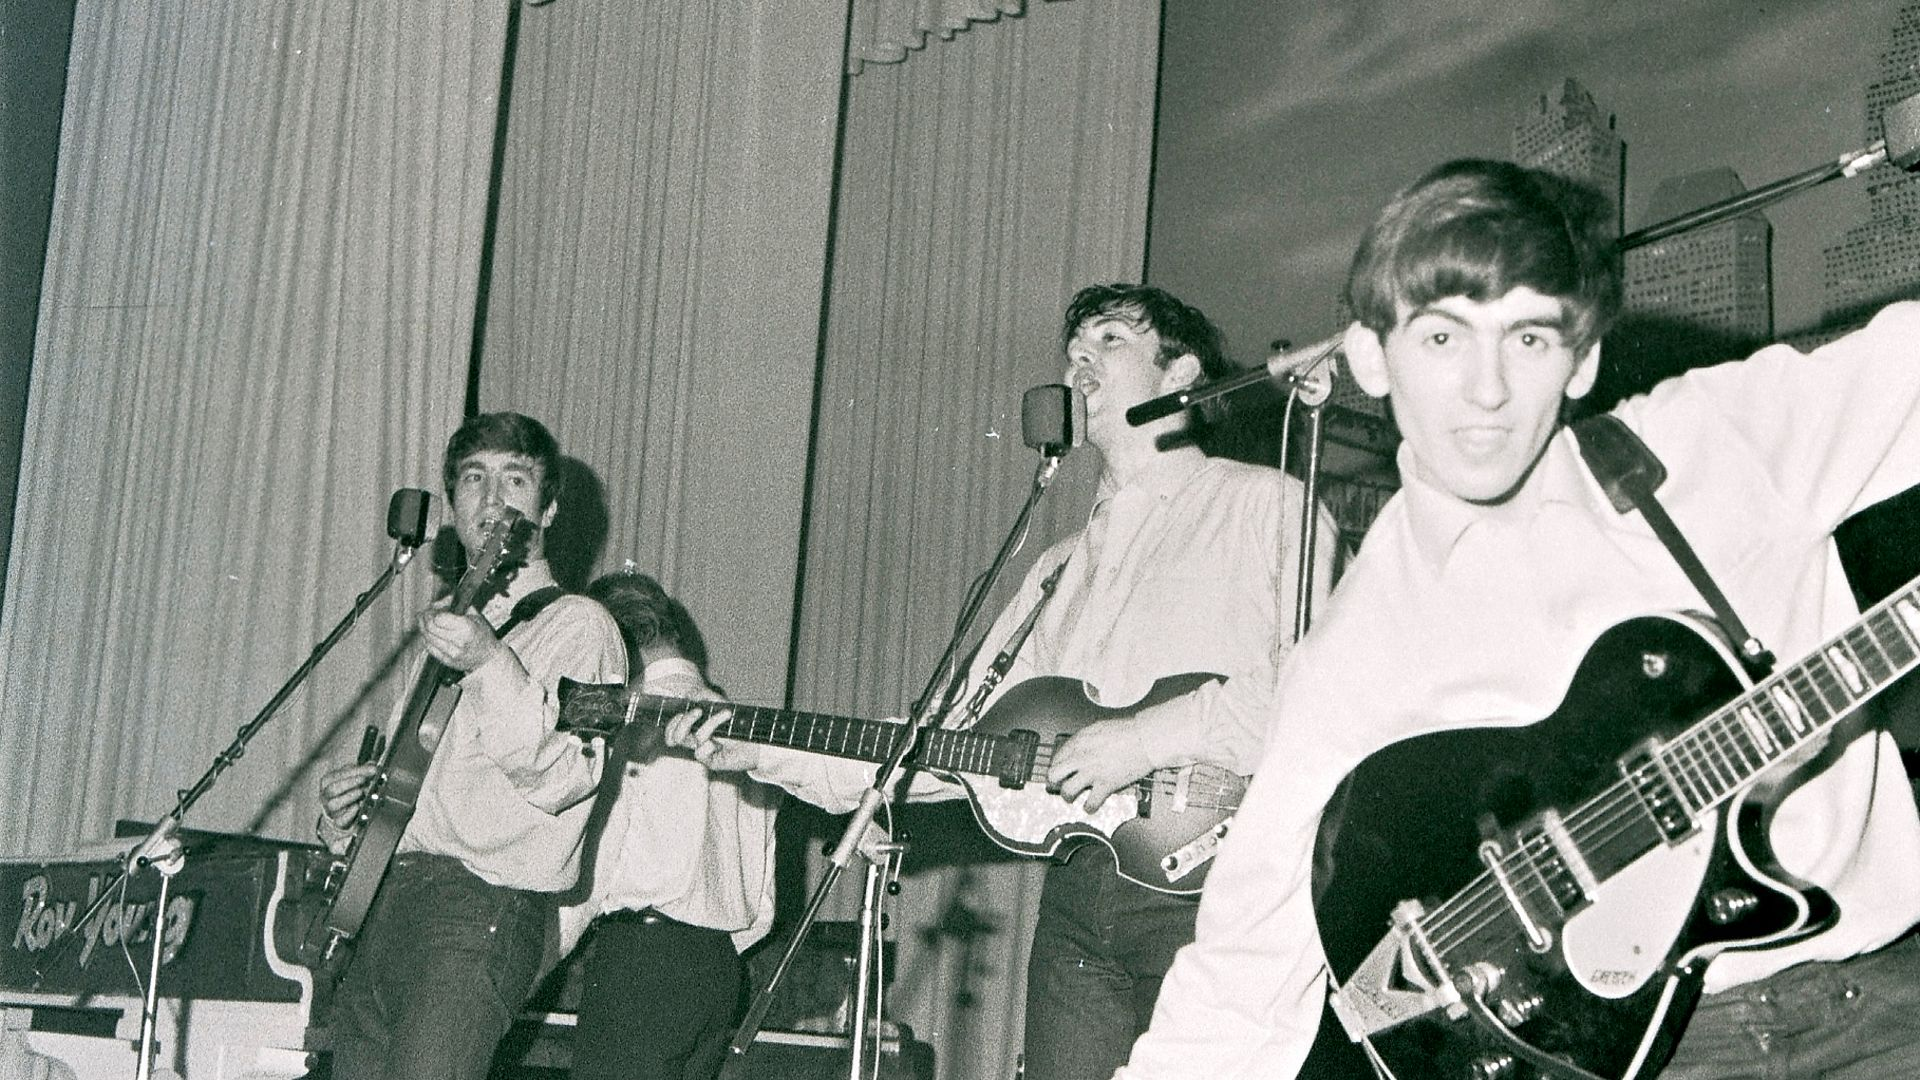 John Lennon, Paul McCartney and George Harrison of the Beatles, at Hamburg's Star-Club, circa May 1962 at the Star-Club in Hamburg, Germany - Credit: Redferns